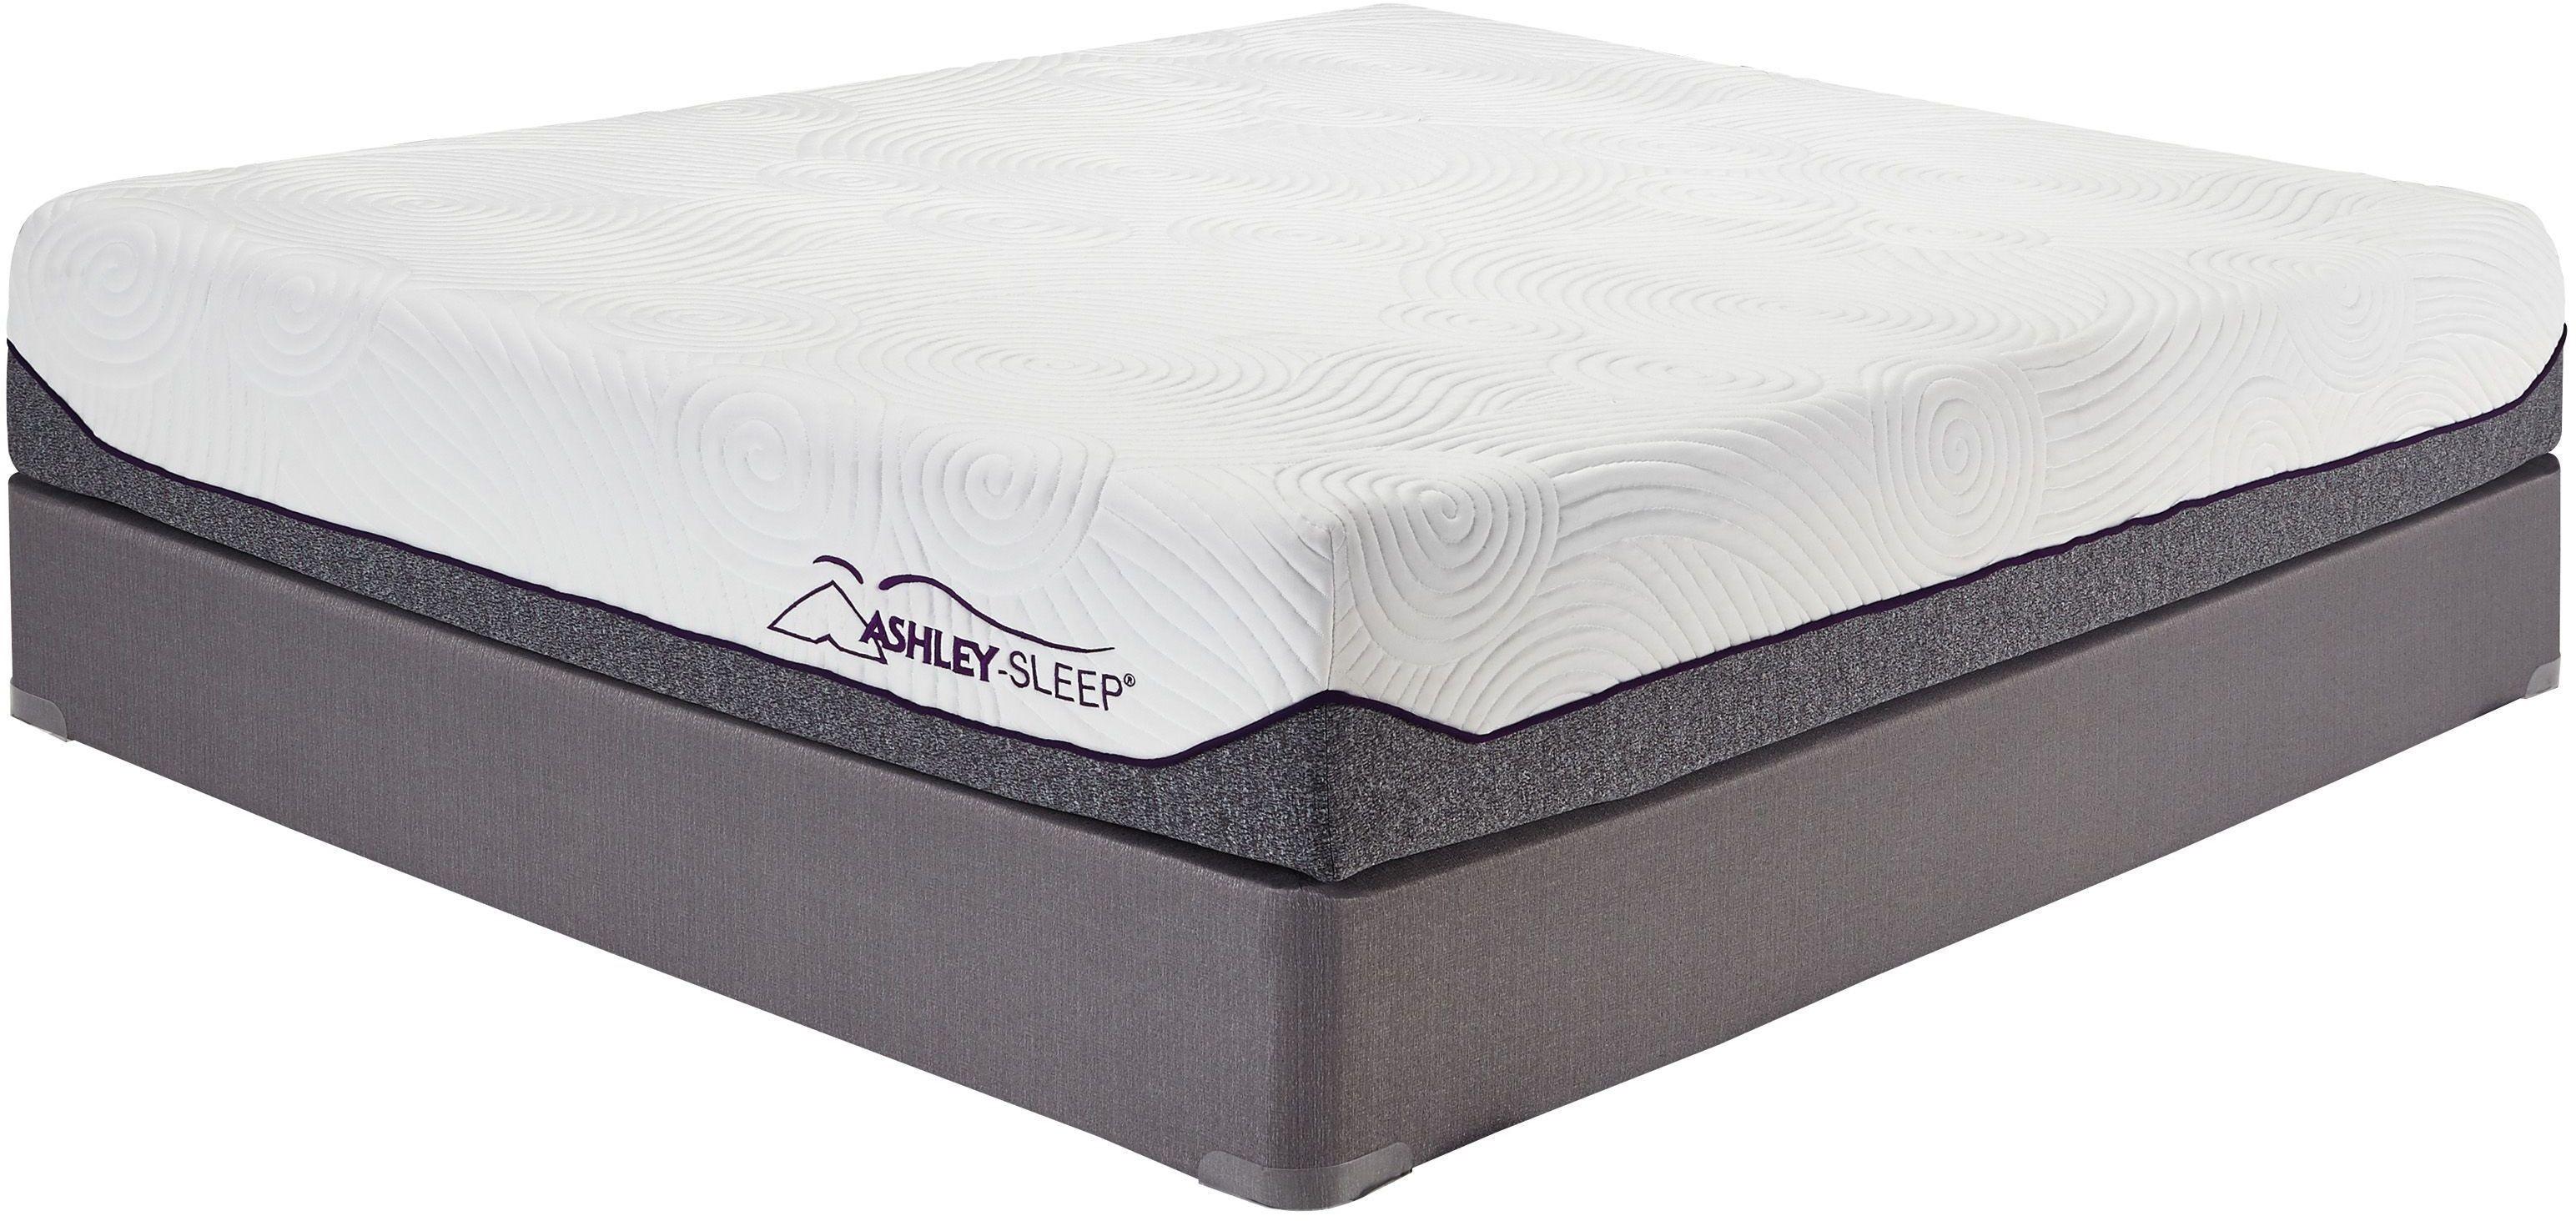 10 Inch Memory Foam White Twin Mattress, M94511, Ashley